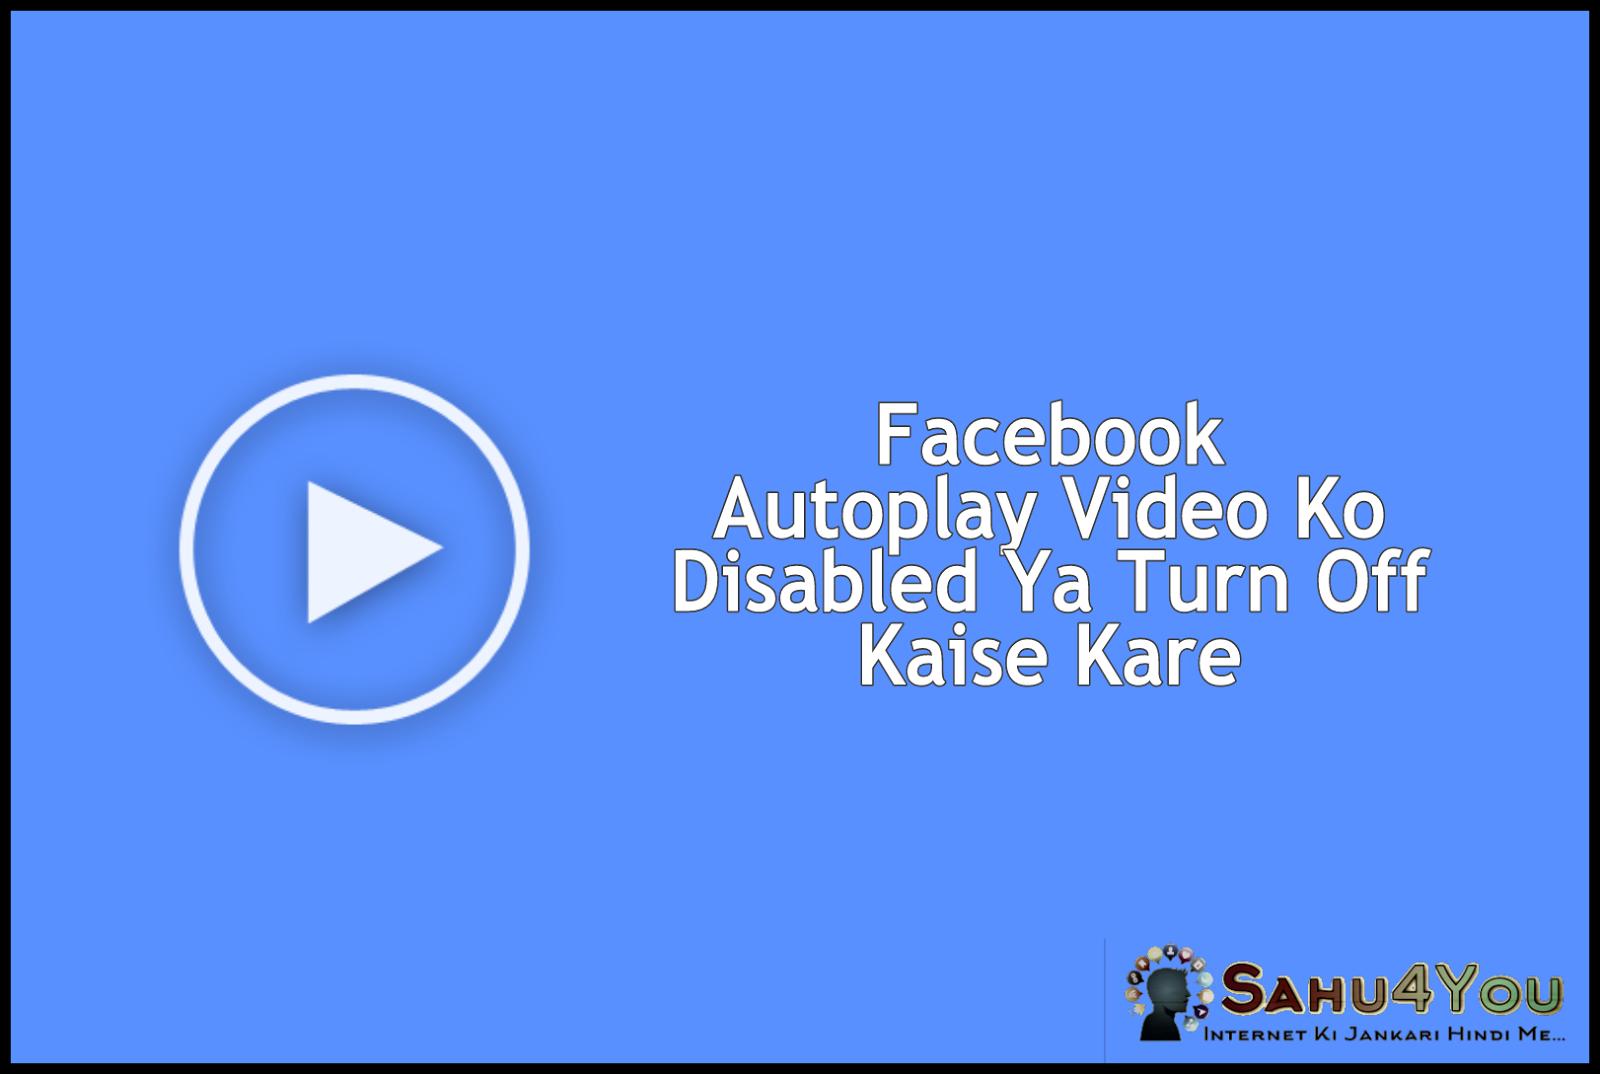 Facebook Me Auto Play Video Kaise Roke